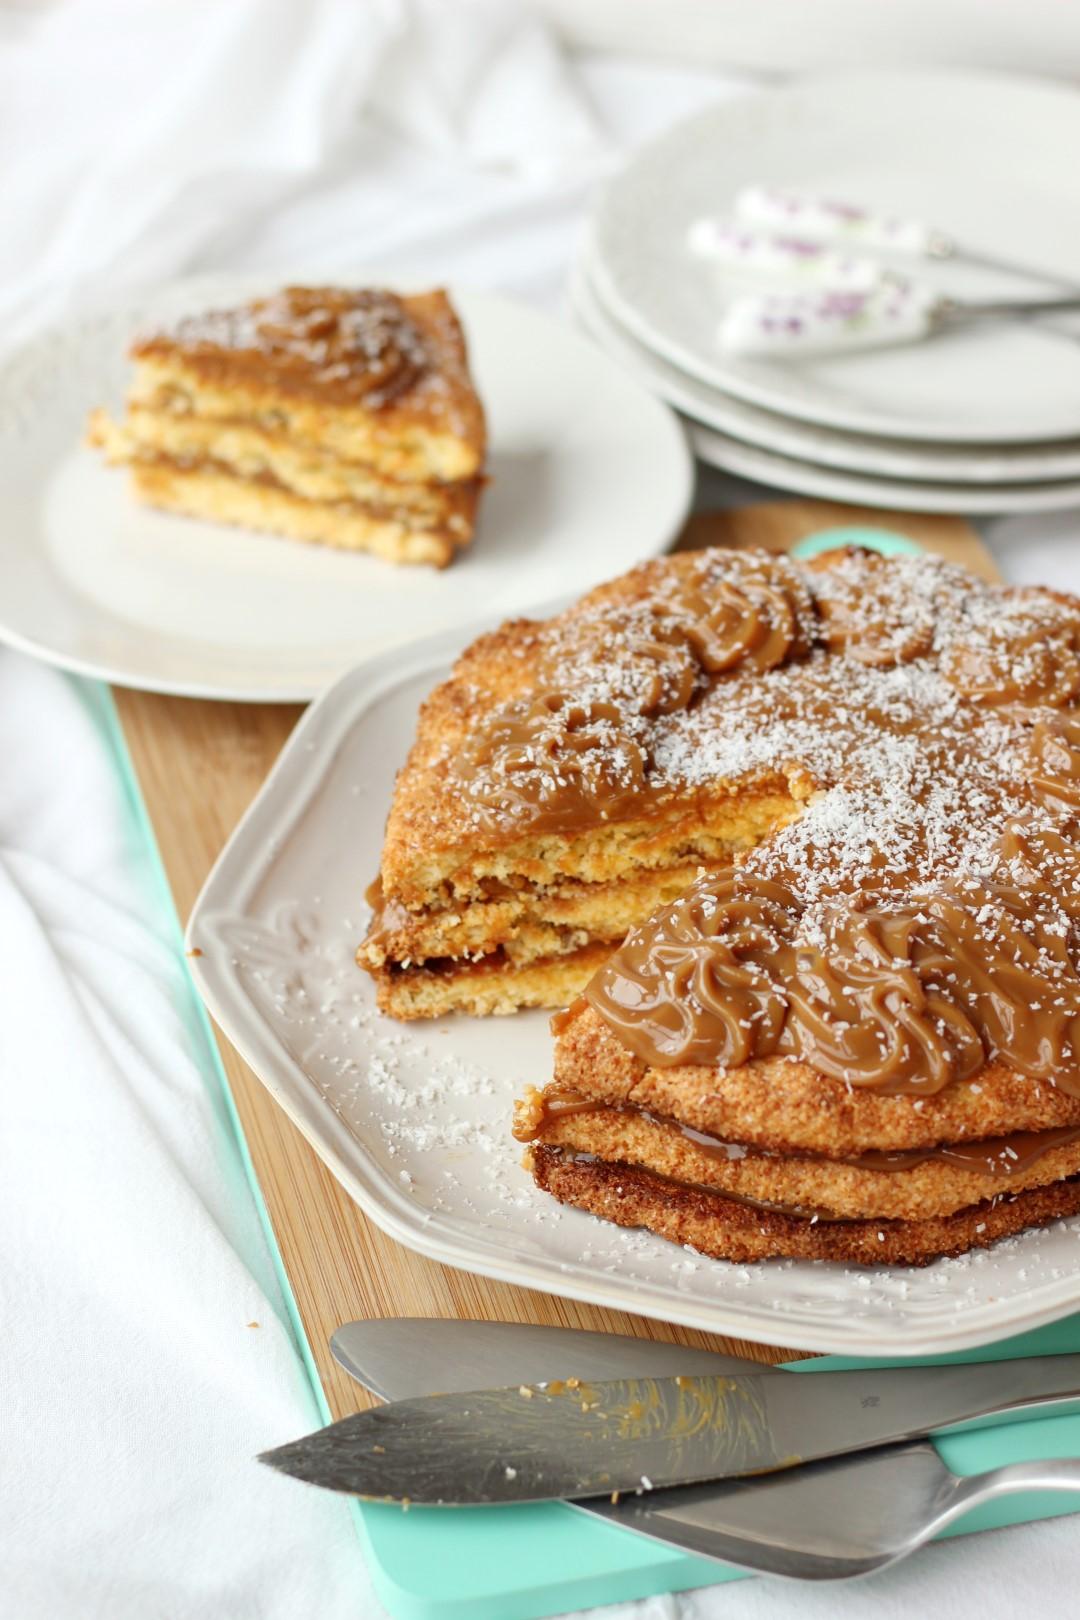 Torta de coco y dulce de leche libre de gluten.